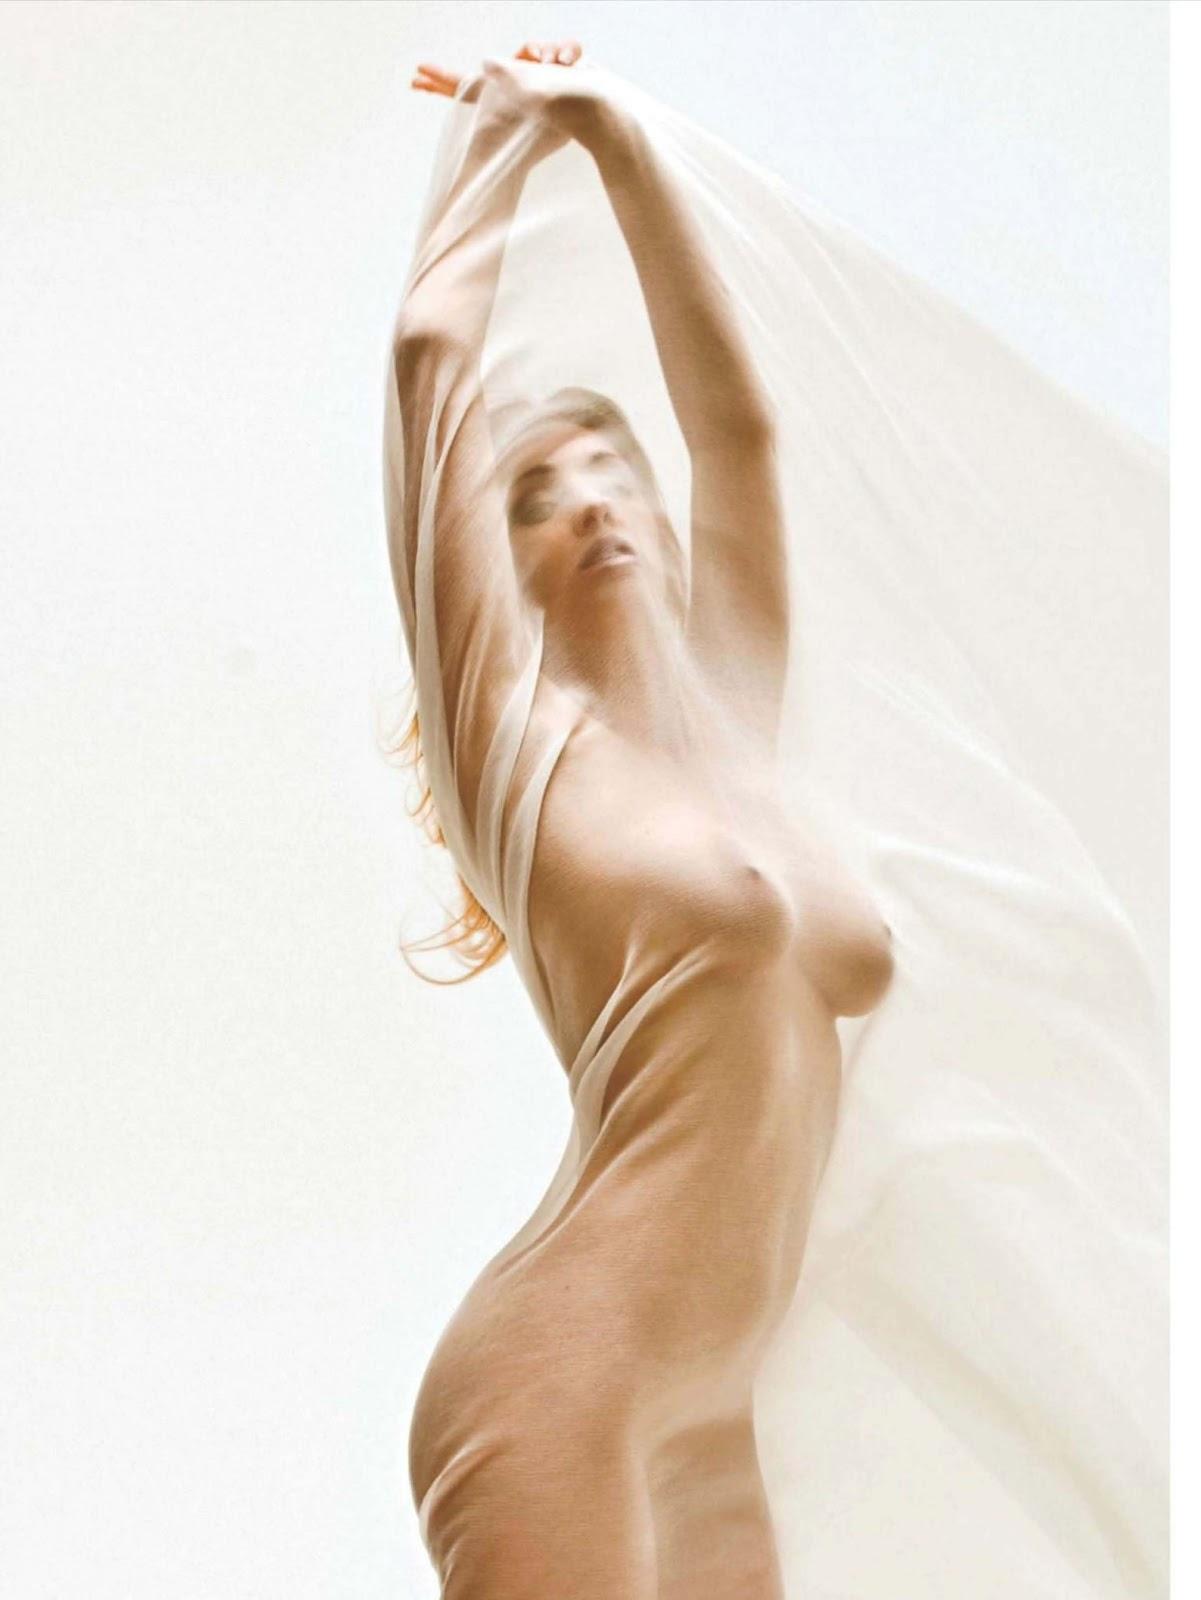 http://1.bp.blogspot.com/-S2fGRWe9IE8/UKI_s8-aXBI/AAAAAAAAp7w/Ma0OSRk2zfA/s1600/septimiu29-Erika+Markato+-+Playboy+Netherlands+-+Dec+2012++(11).jpg